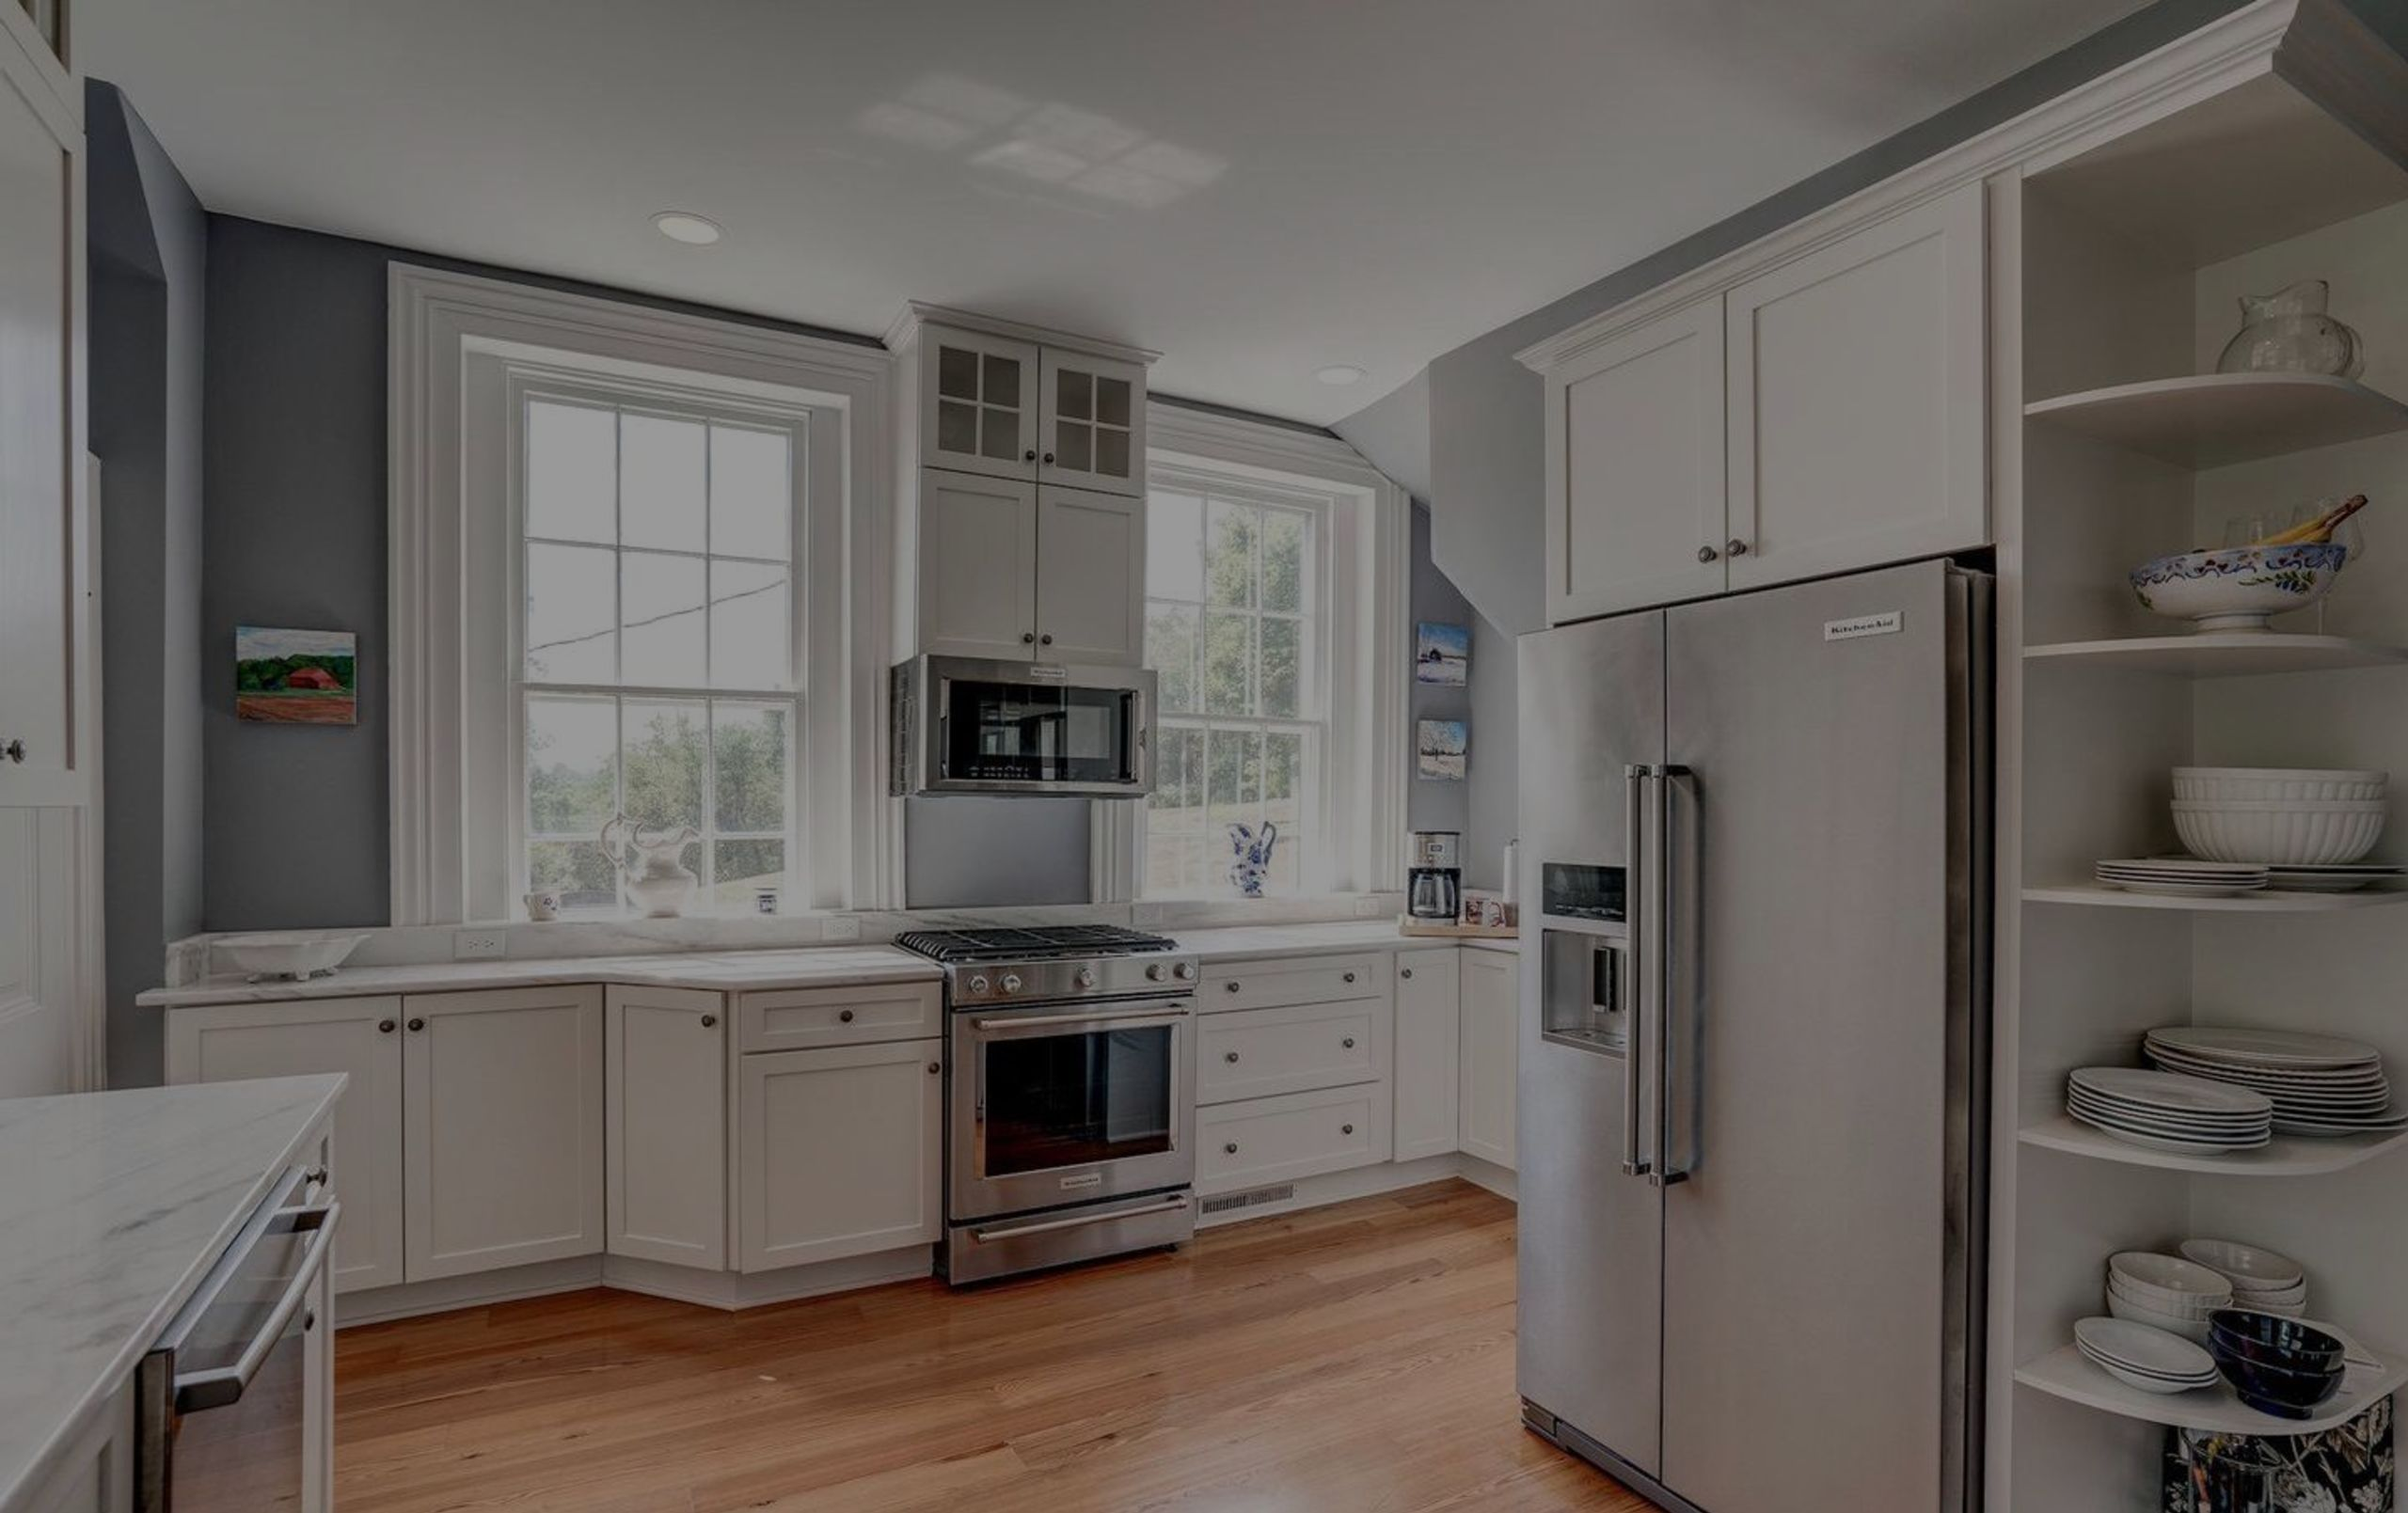 Open Houses | 8/24-25 in Loudoun, Frederick & Fauquier